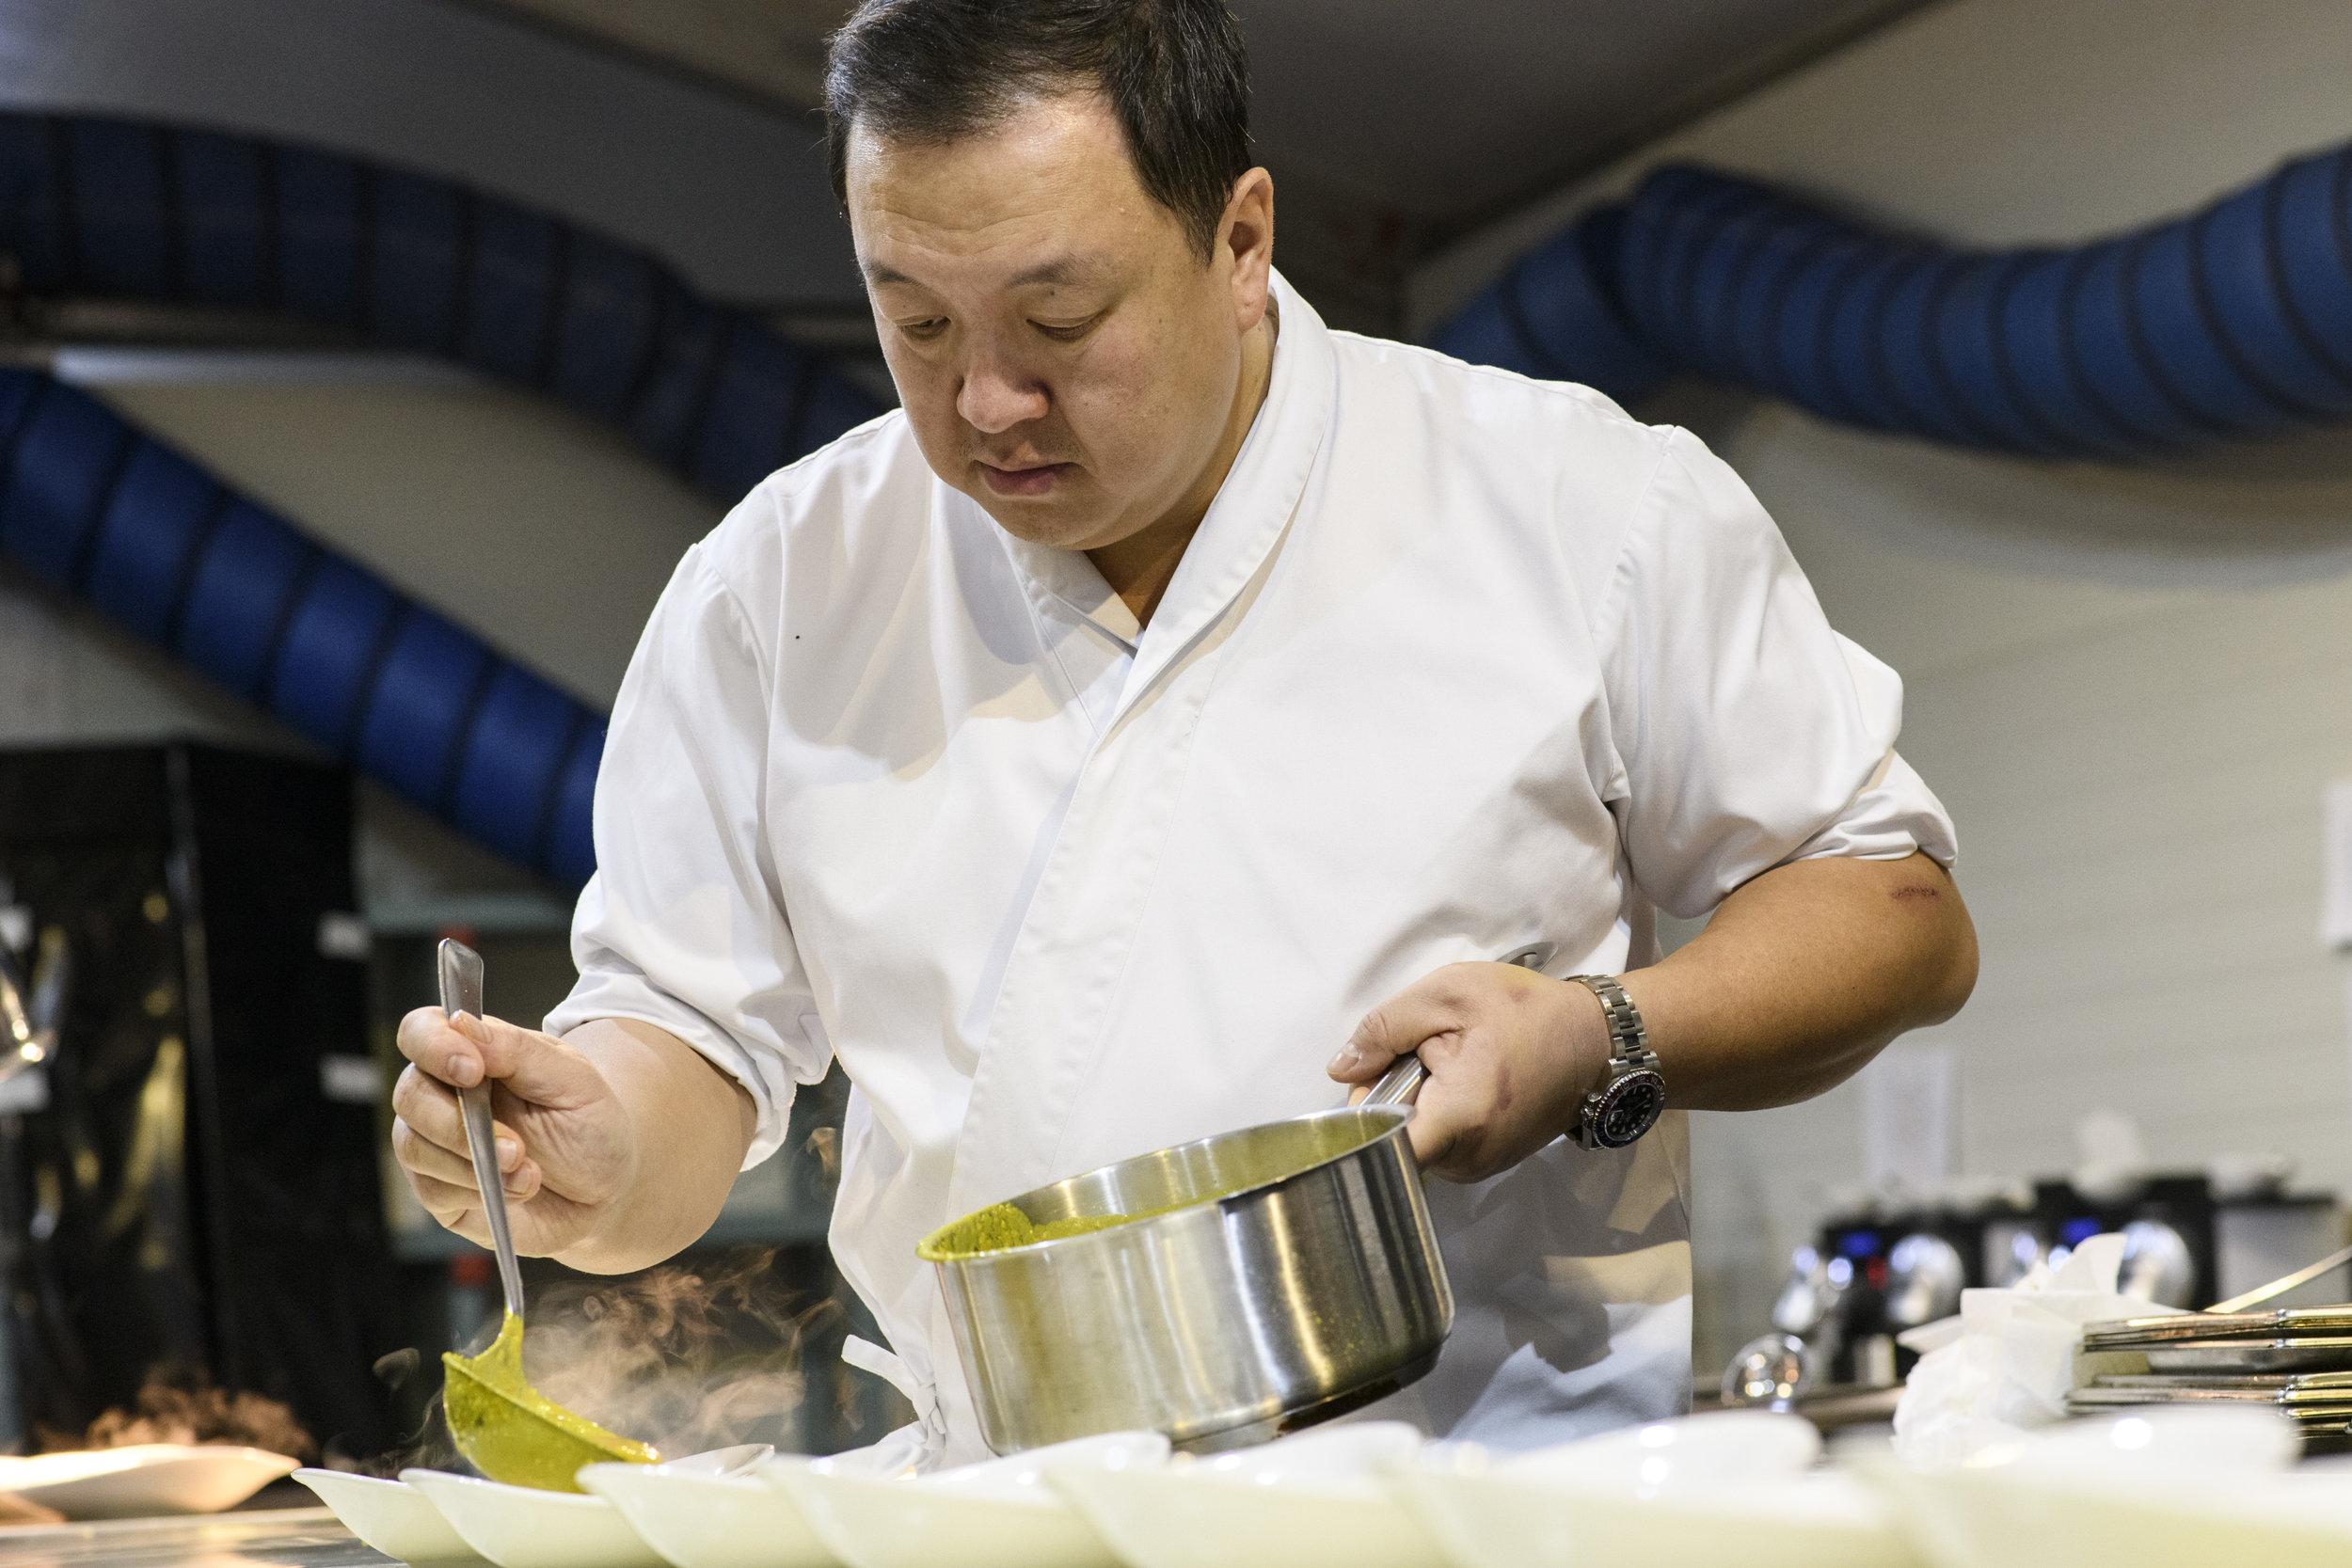 Chef The Duc Ngo. Photo courtesy of Berlinale/ Piero Chiusi